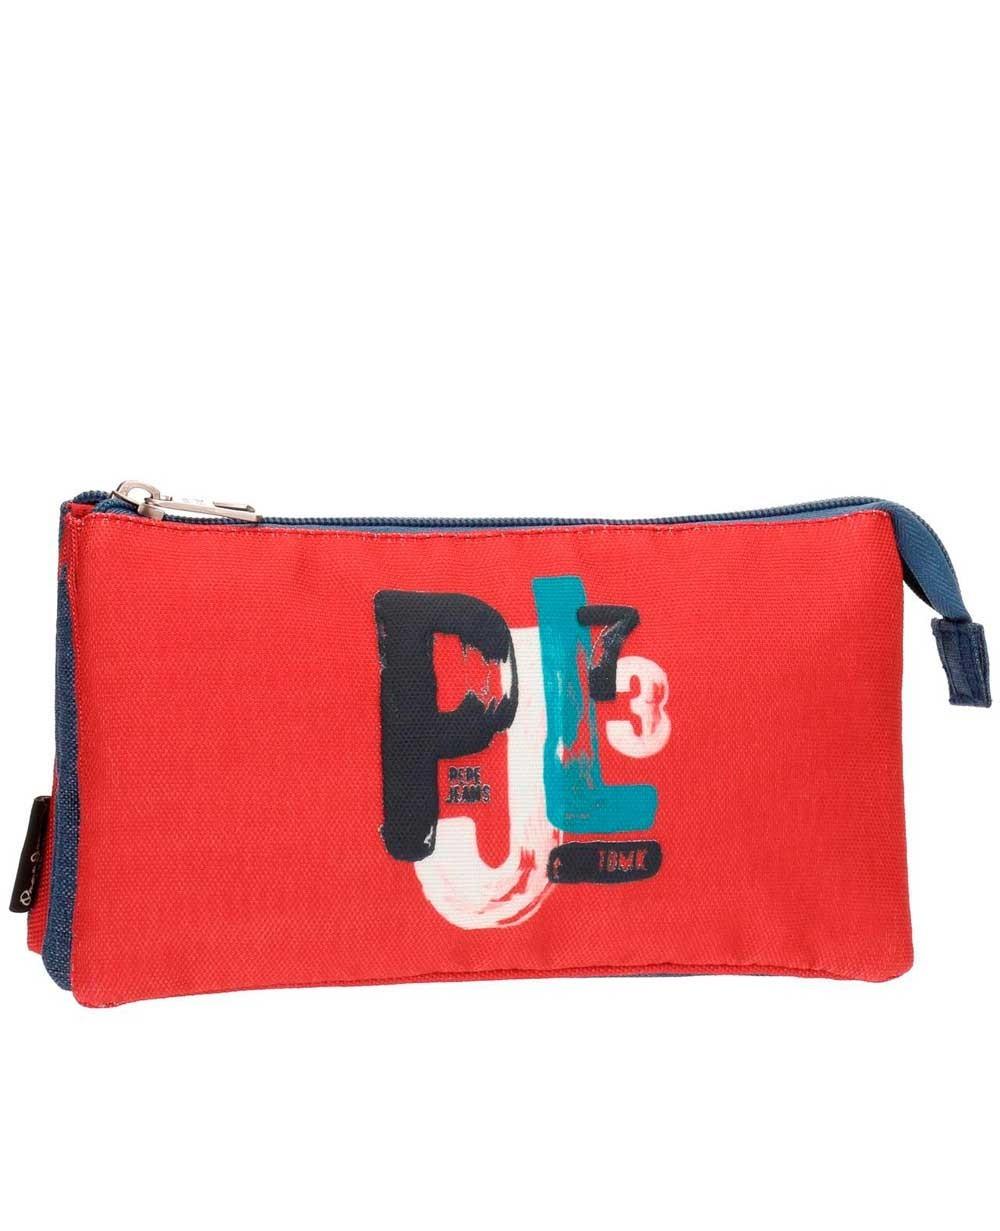 Pepe Jeans James Estuche grande Rojo (Foto )